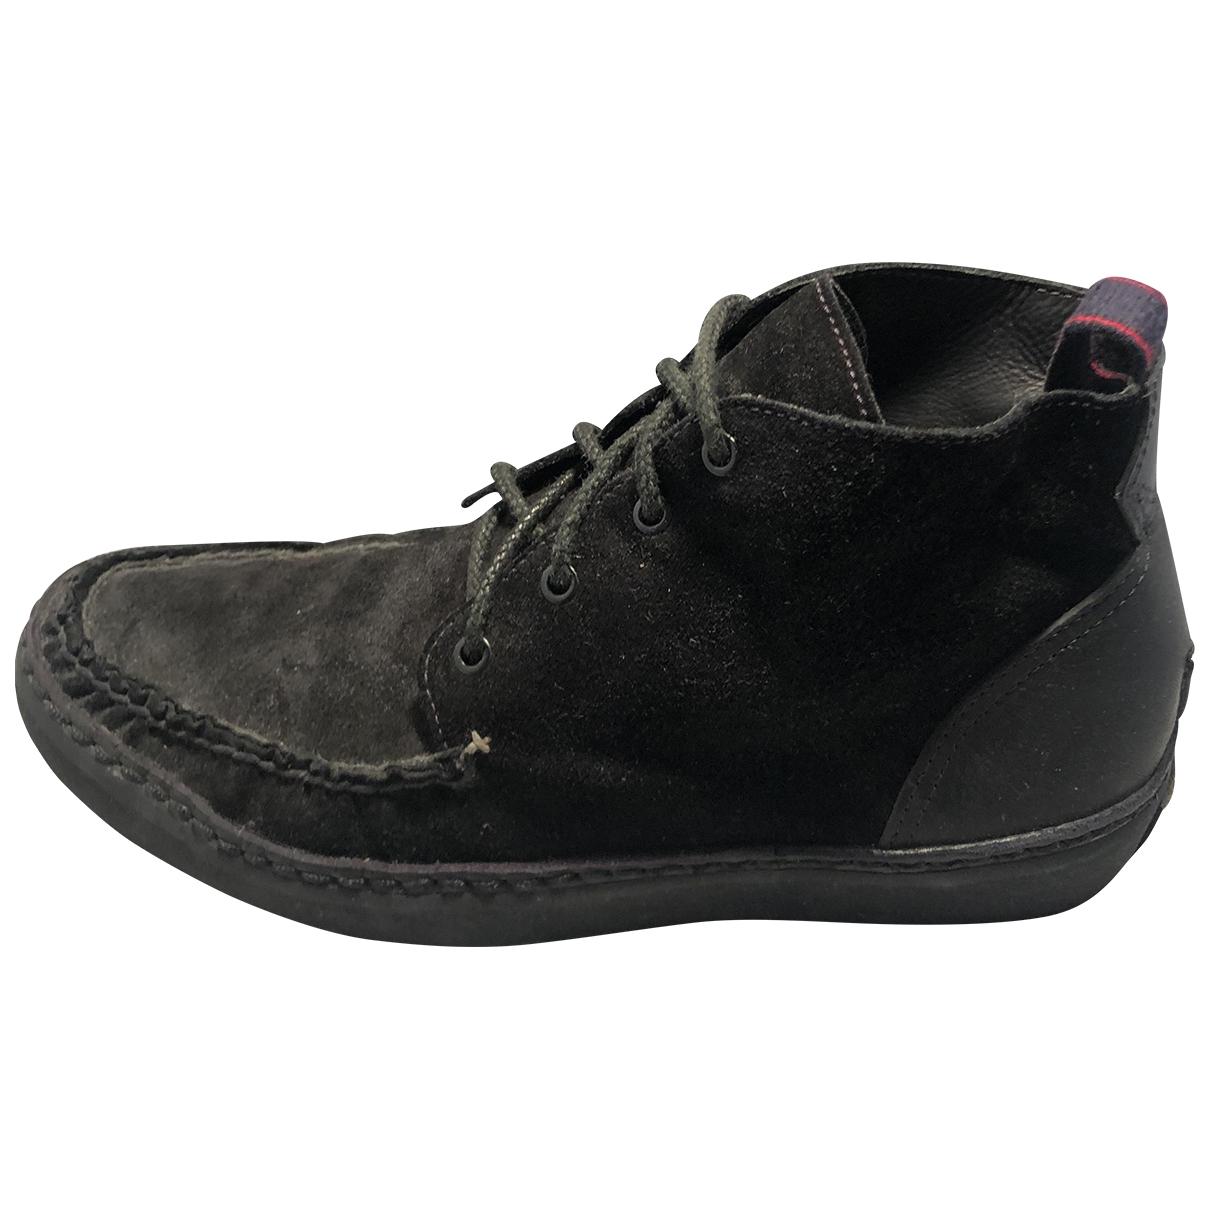 Rag & Bone \N Stiefel in  Schwarz Veloursleder